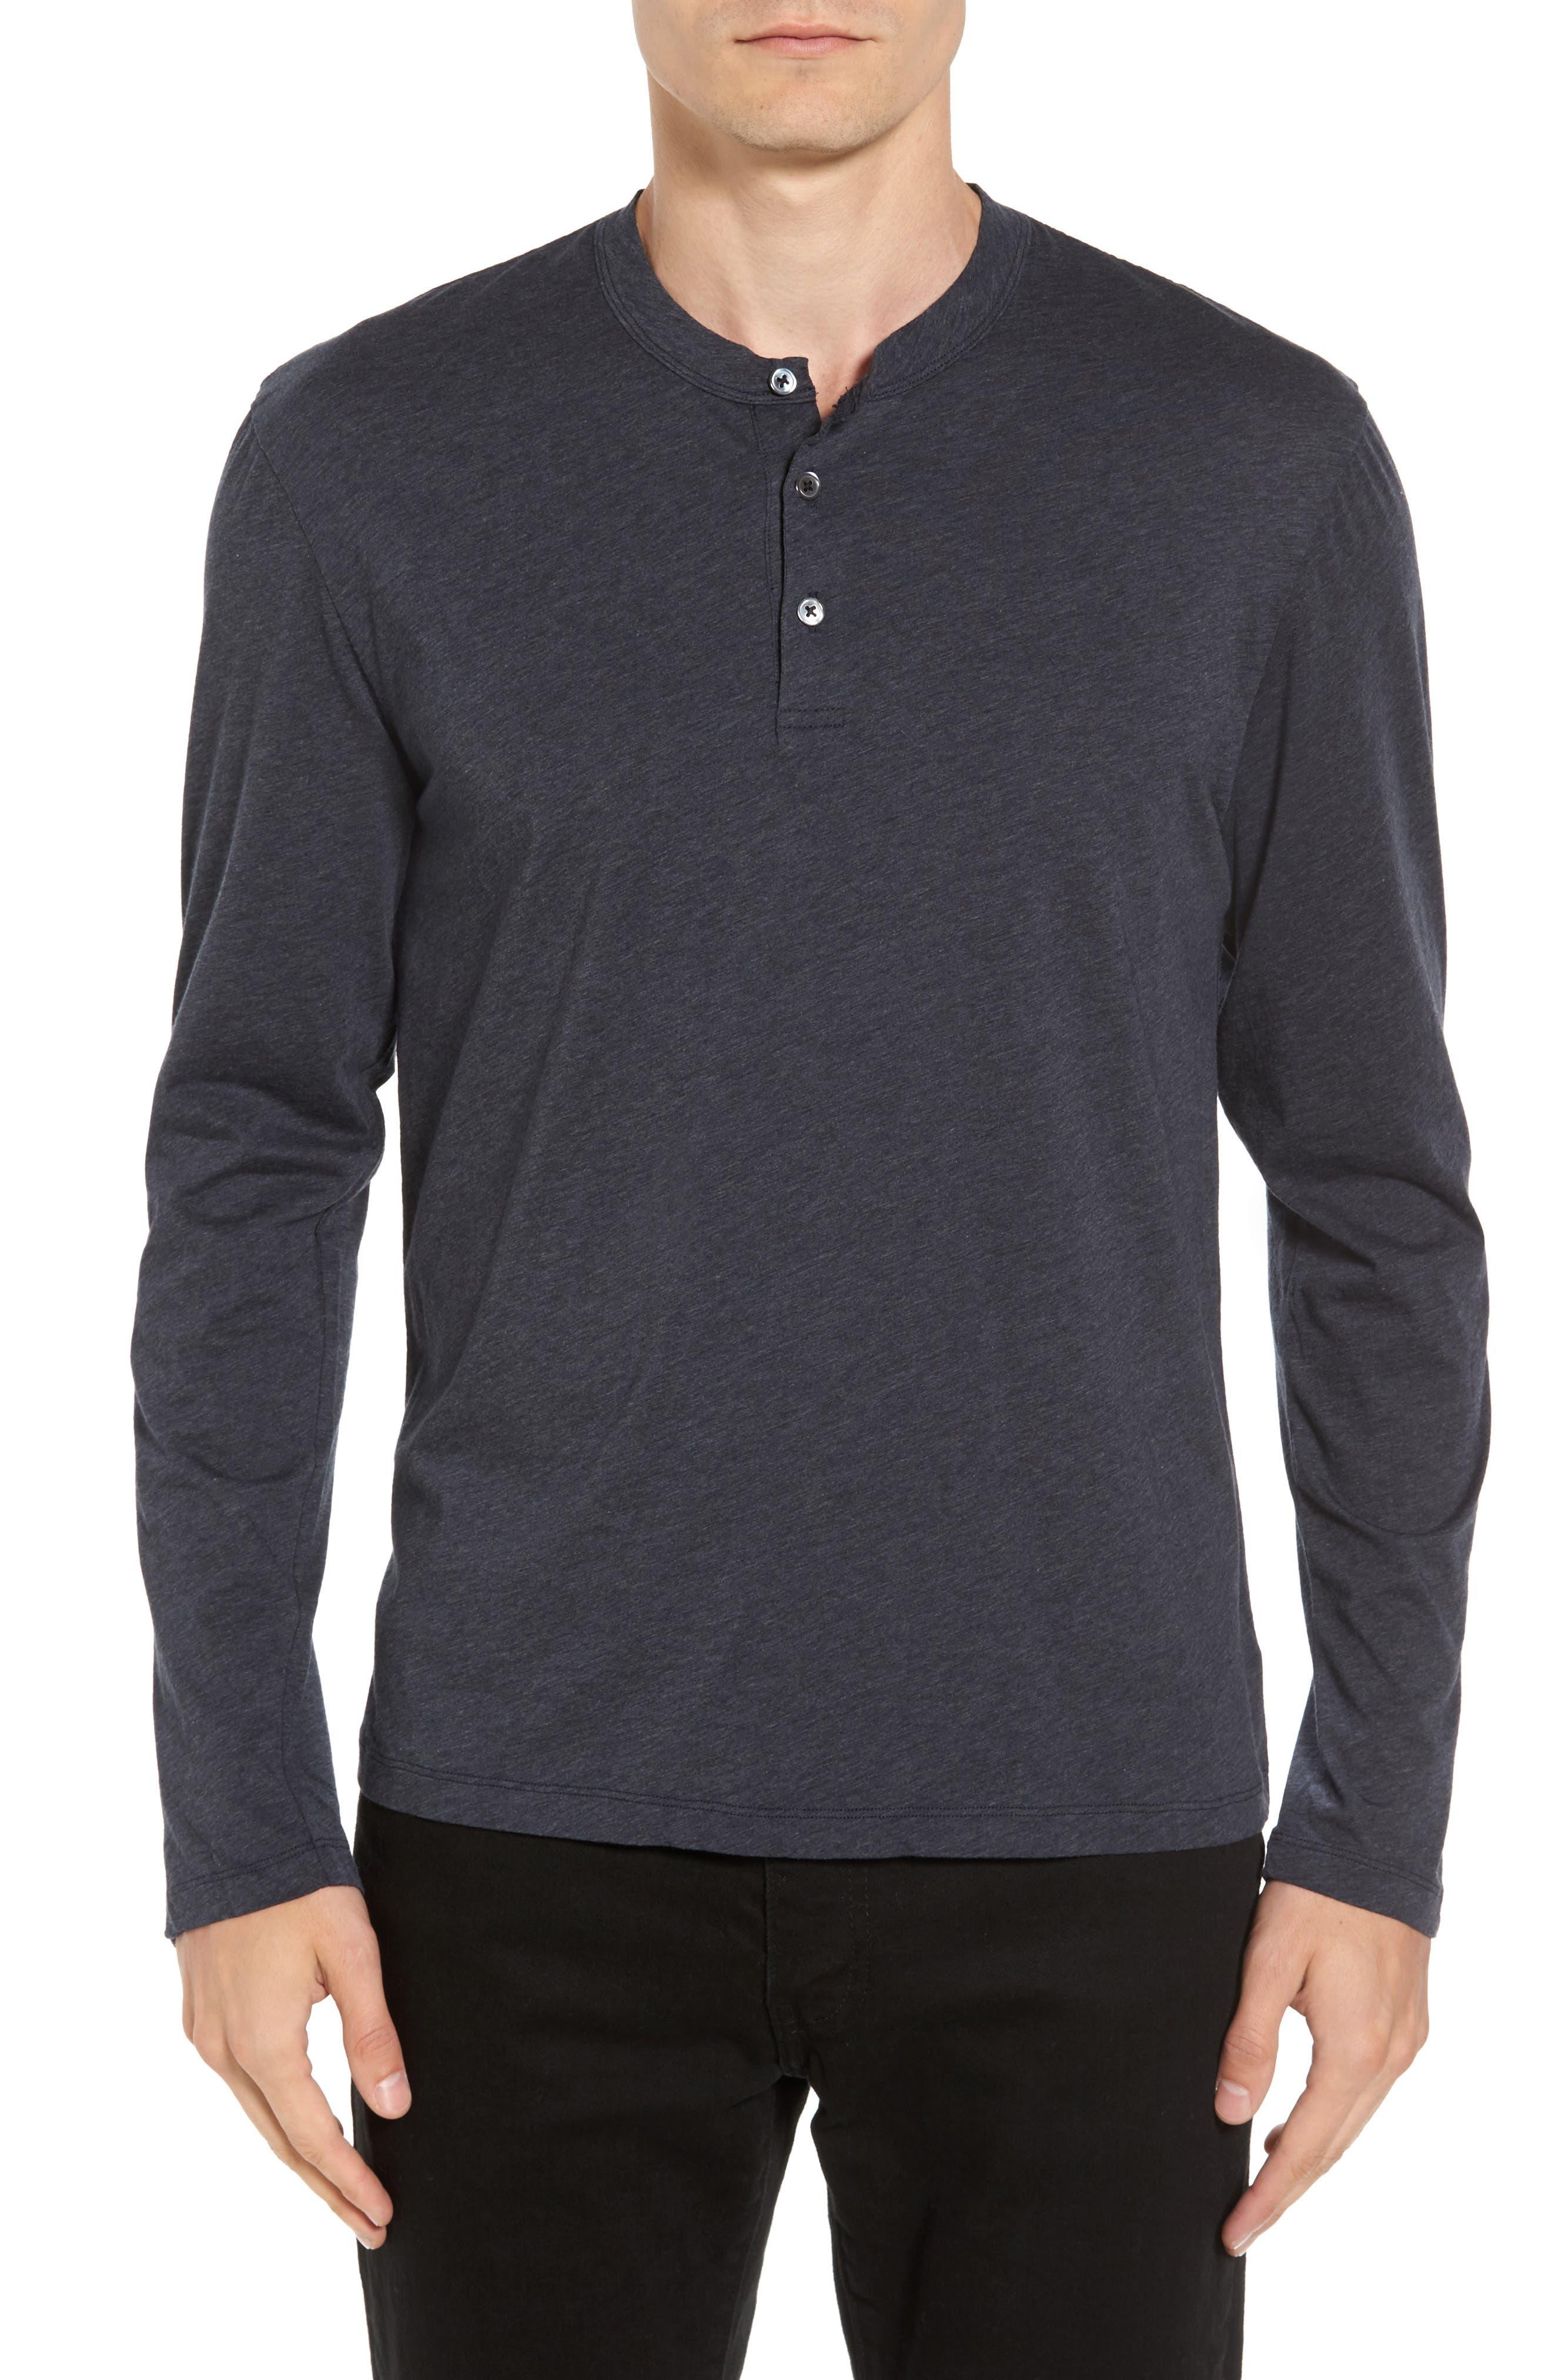 James Perse Long Sleeve Cotton & Cashmere Henley T-Shirt